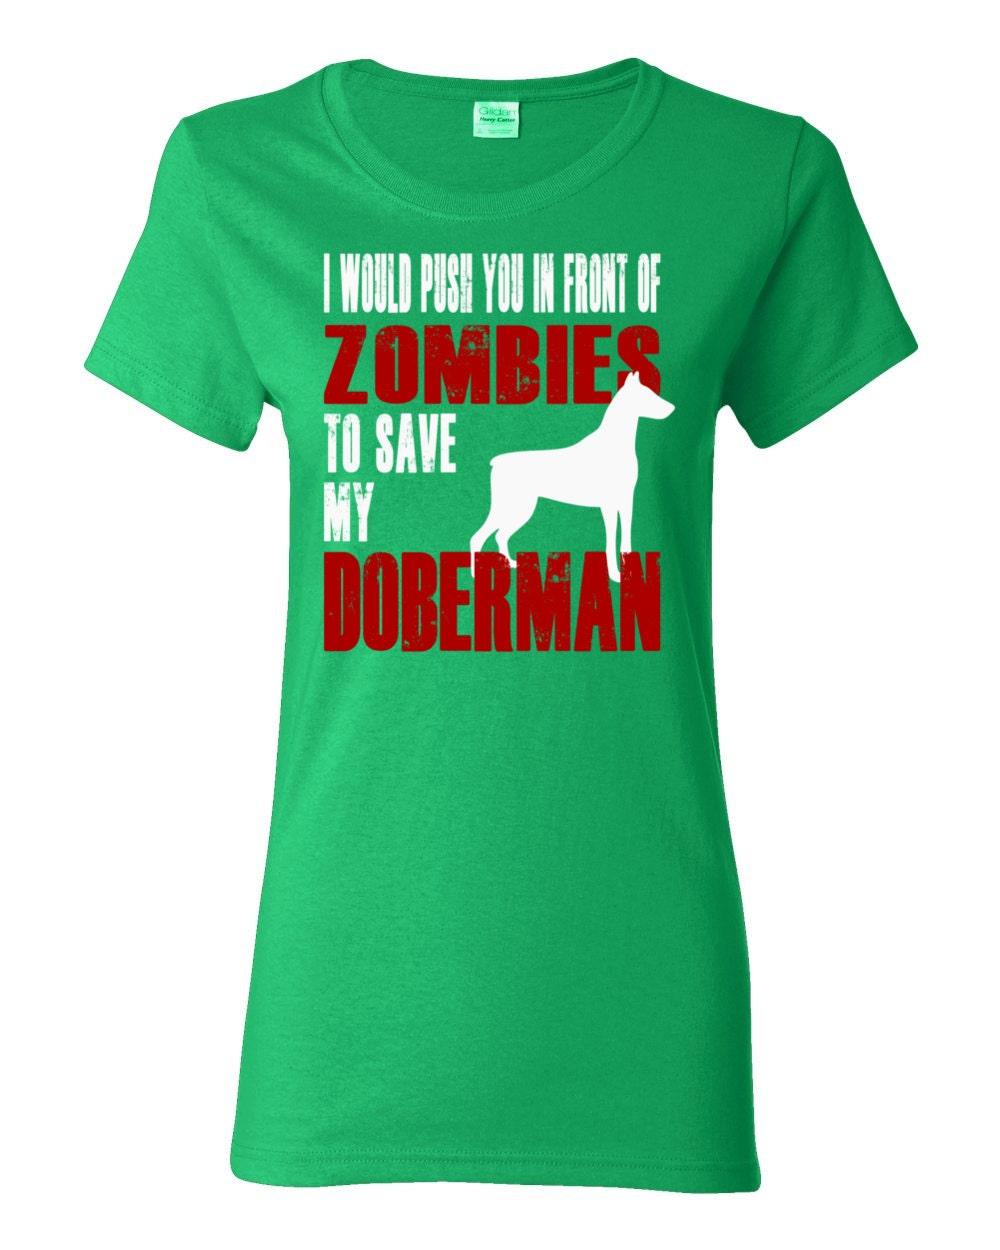 Doberman Womens Shirt - I Would Push You In Front Of Zombies To Save My Doberman - My Dog Doberman Womens T-shirt